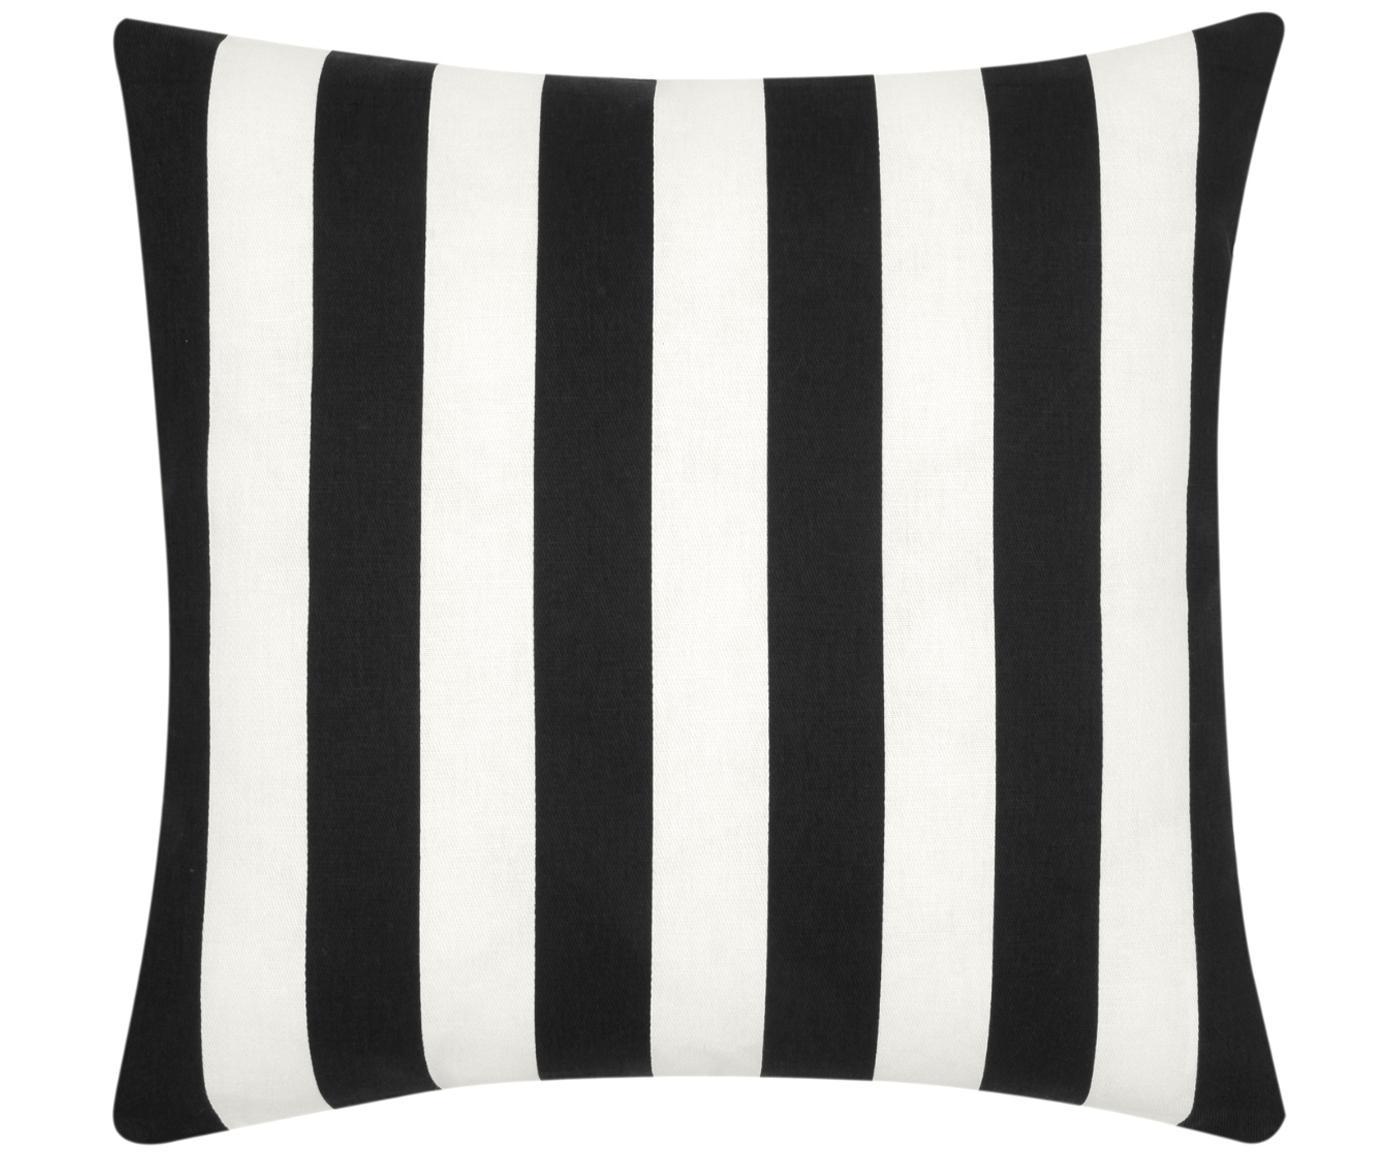 Kussenhoes Timon, 100% katoen, Zwart, wit, 45 x 45 cm